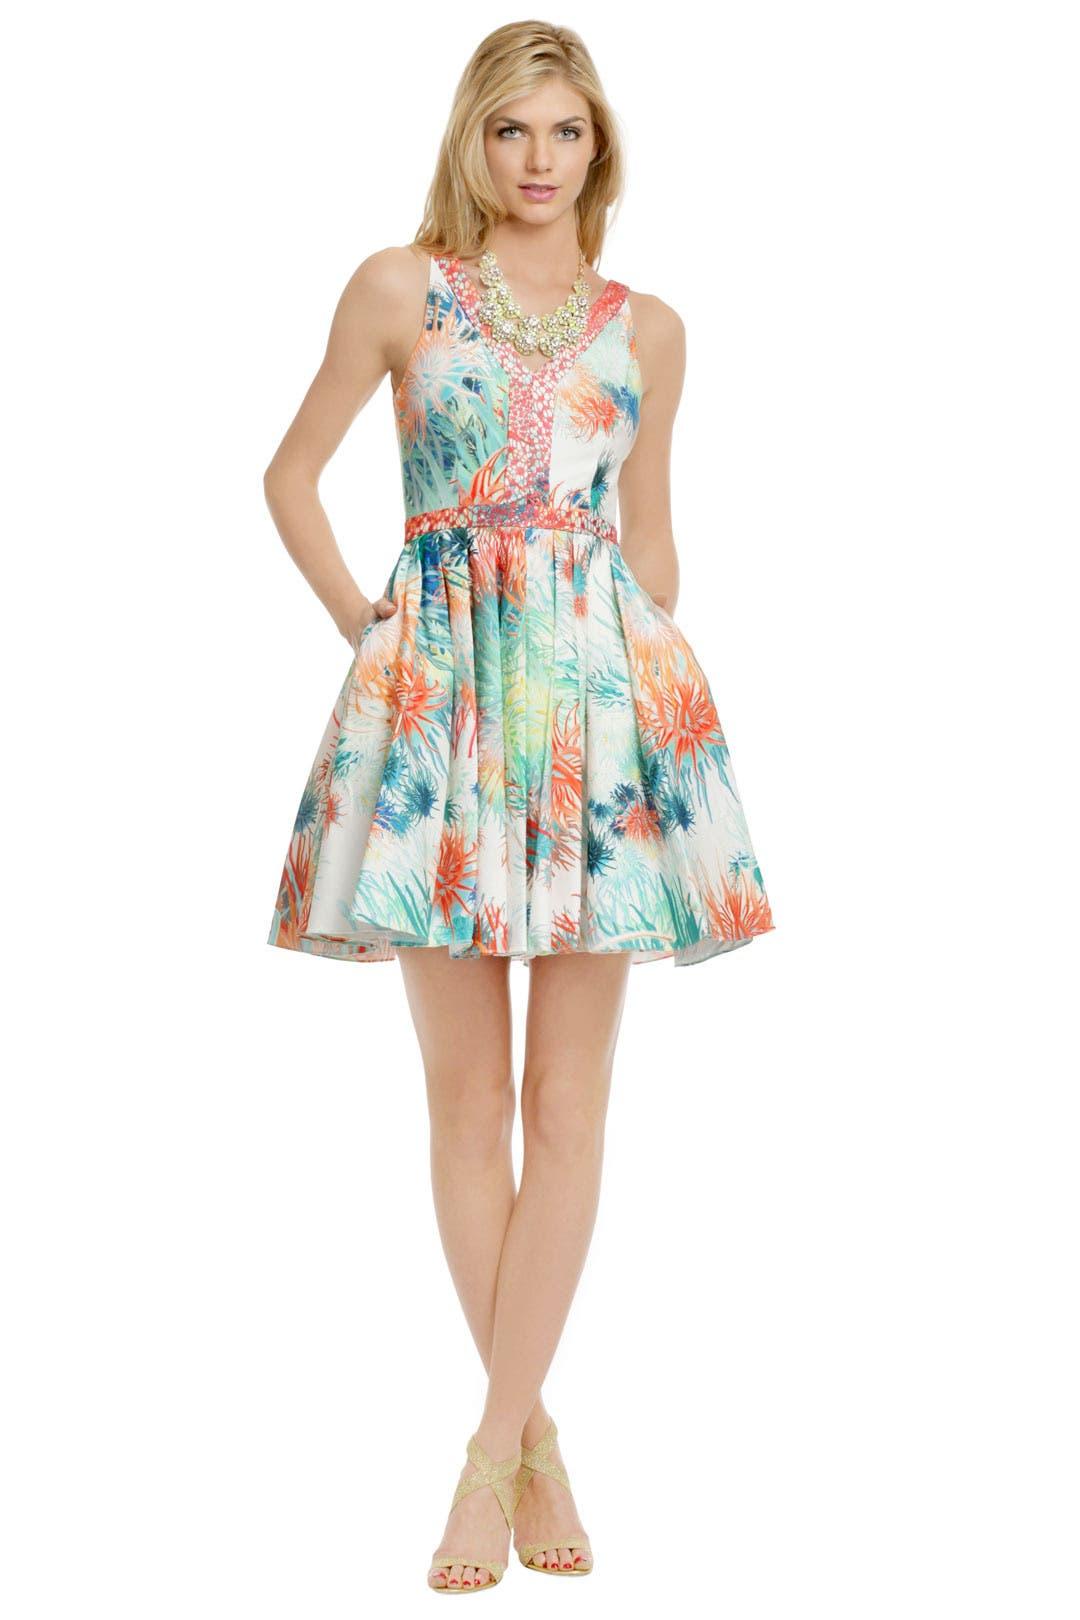 Coral Sea Urchin Dress by Christian Cota